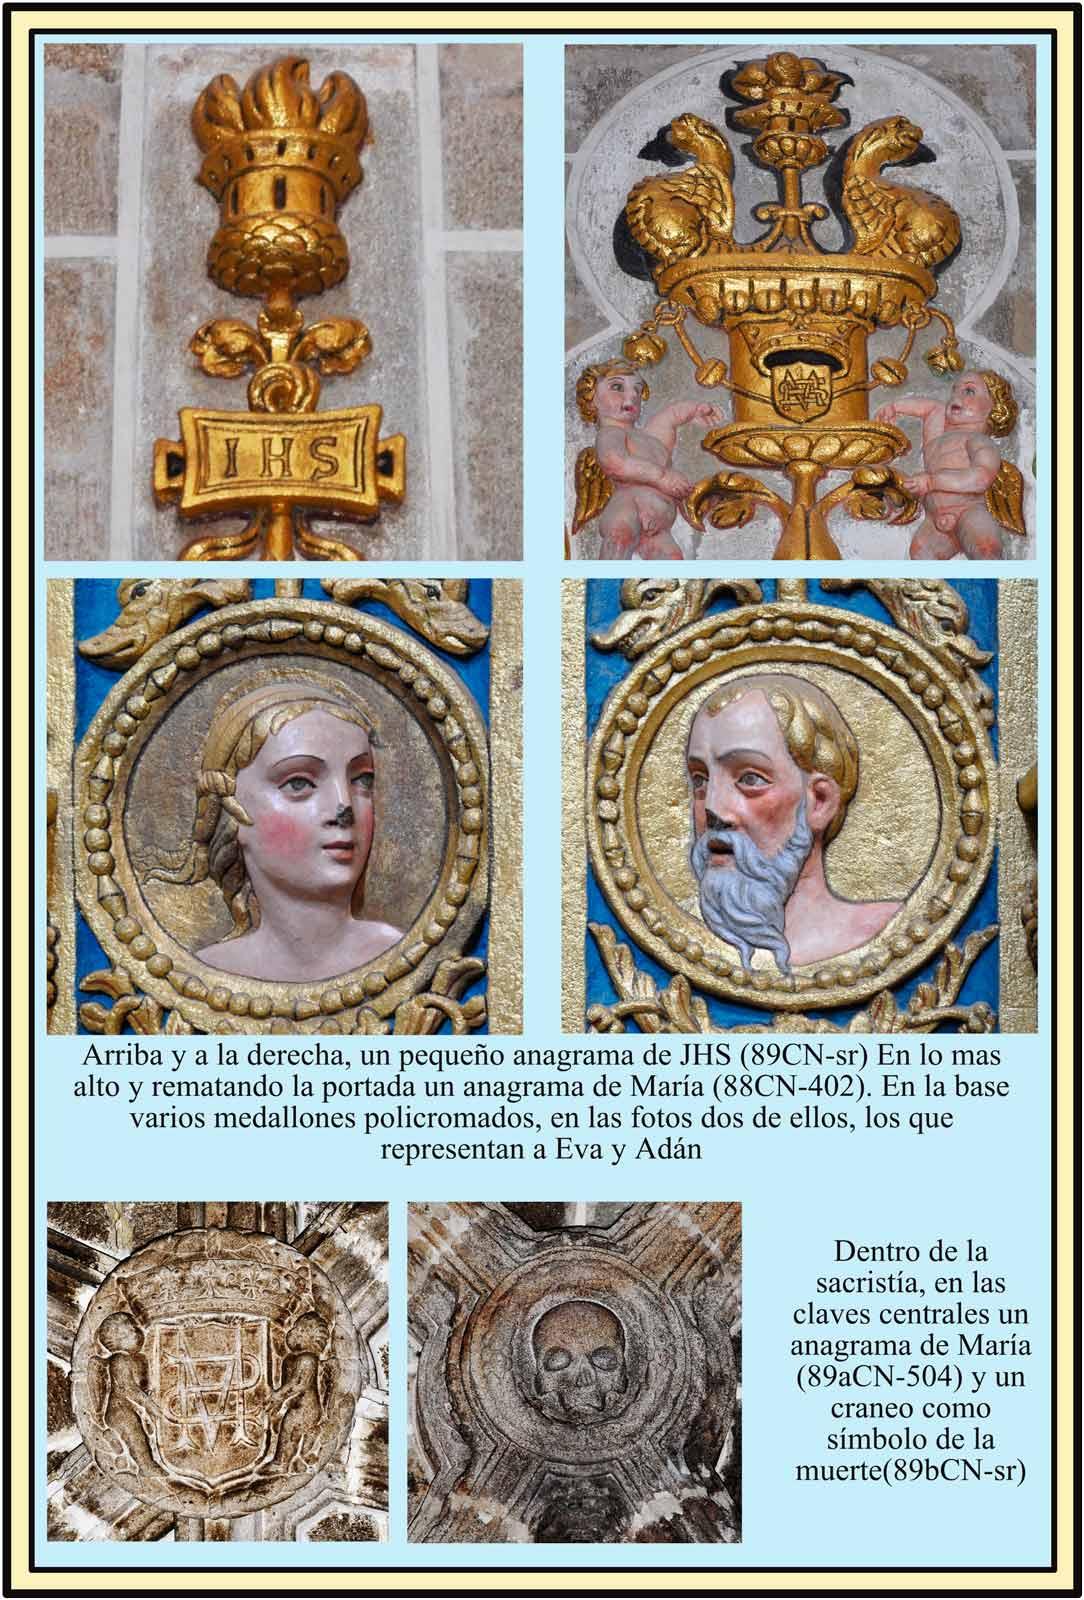 Plasencia escudos Portada Plateresca de la sacristia Adan Eva